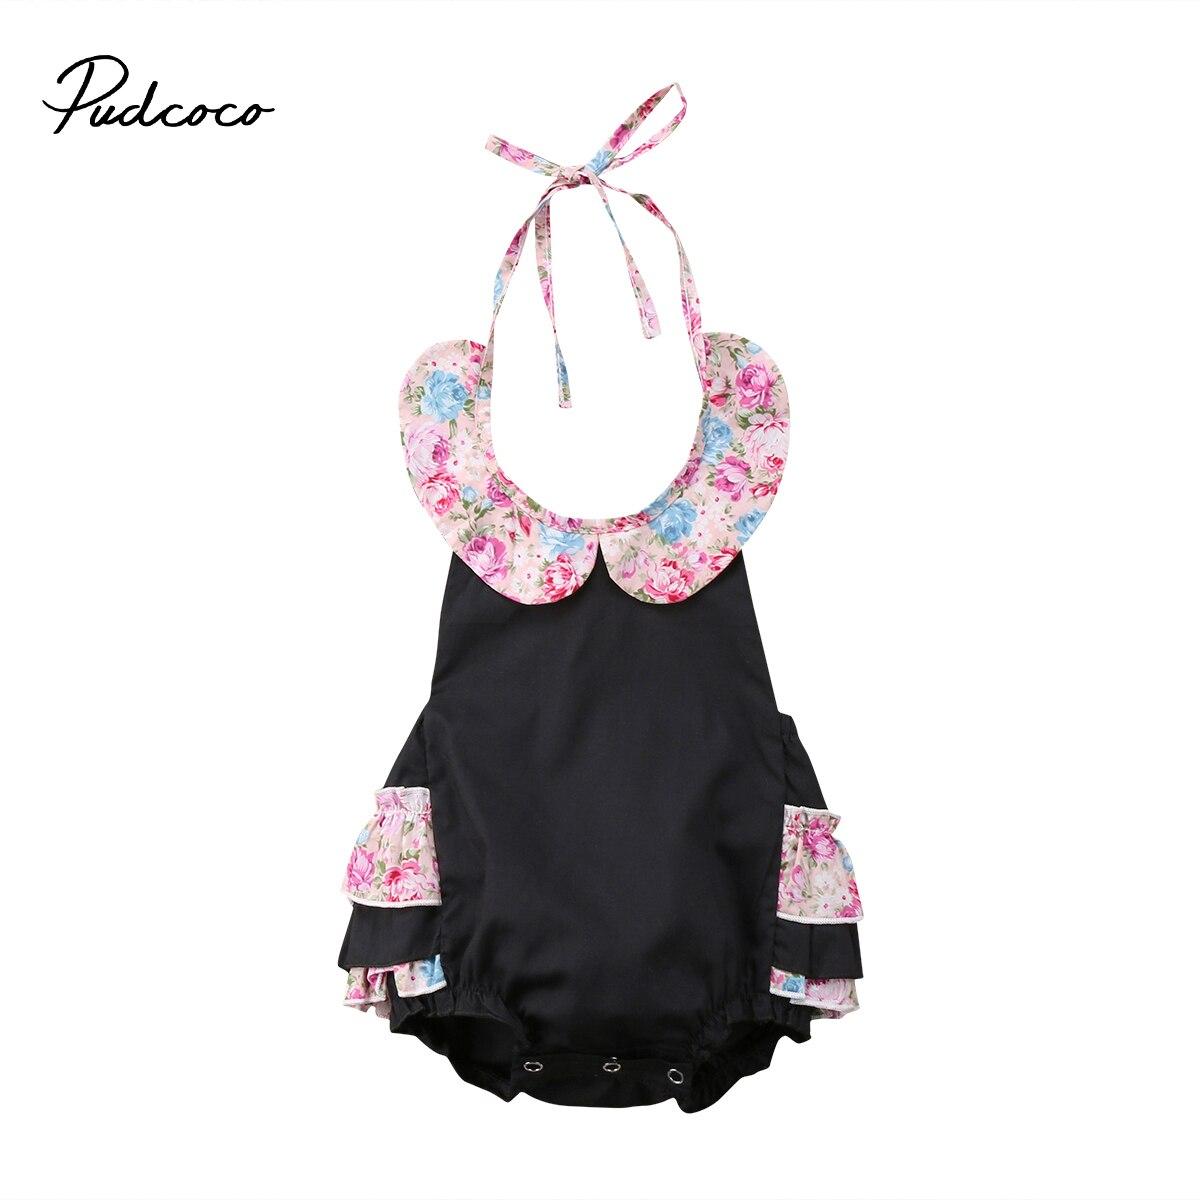 Pudcoco Newborn Infant Baby Girls Floral Romper Playsuit Jumpsuit Outfits Sunsuit One-Pieces Clothes